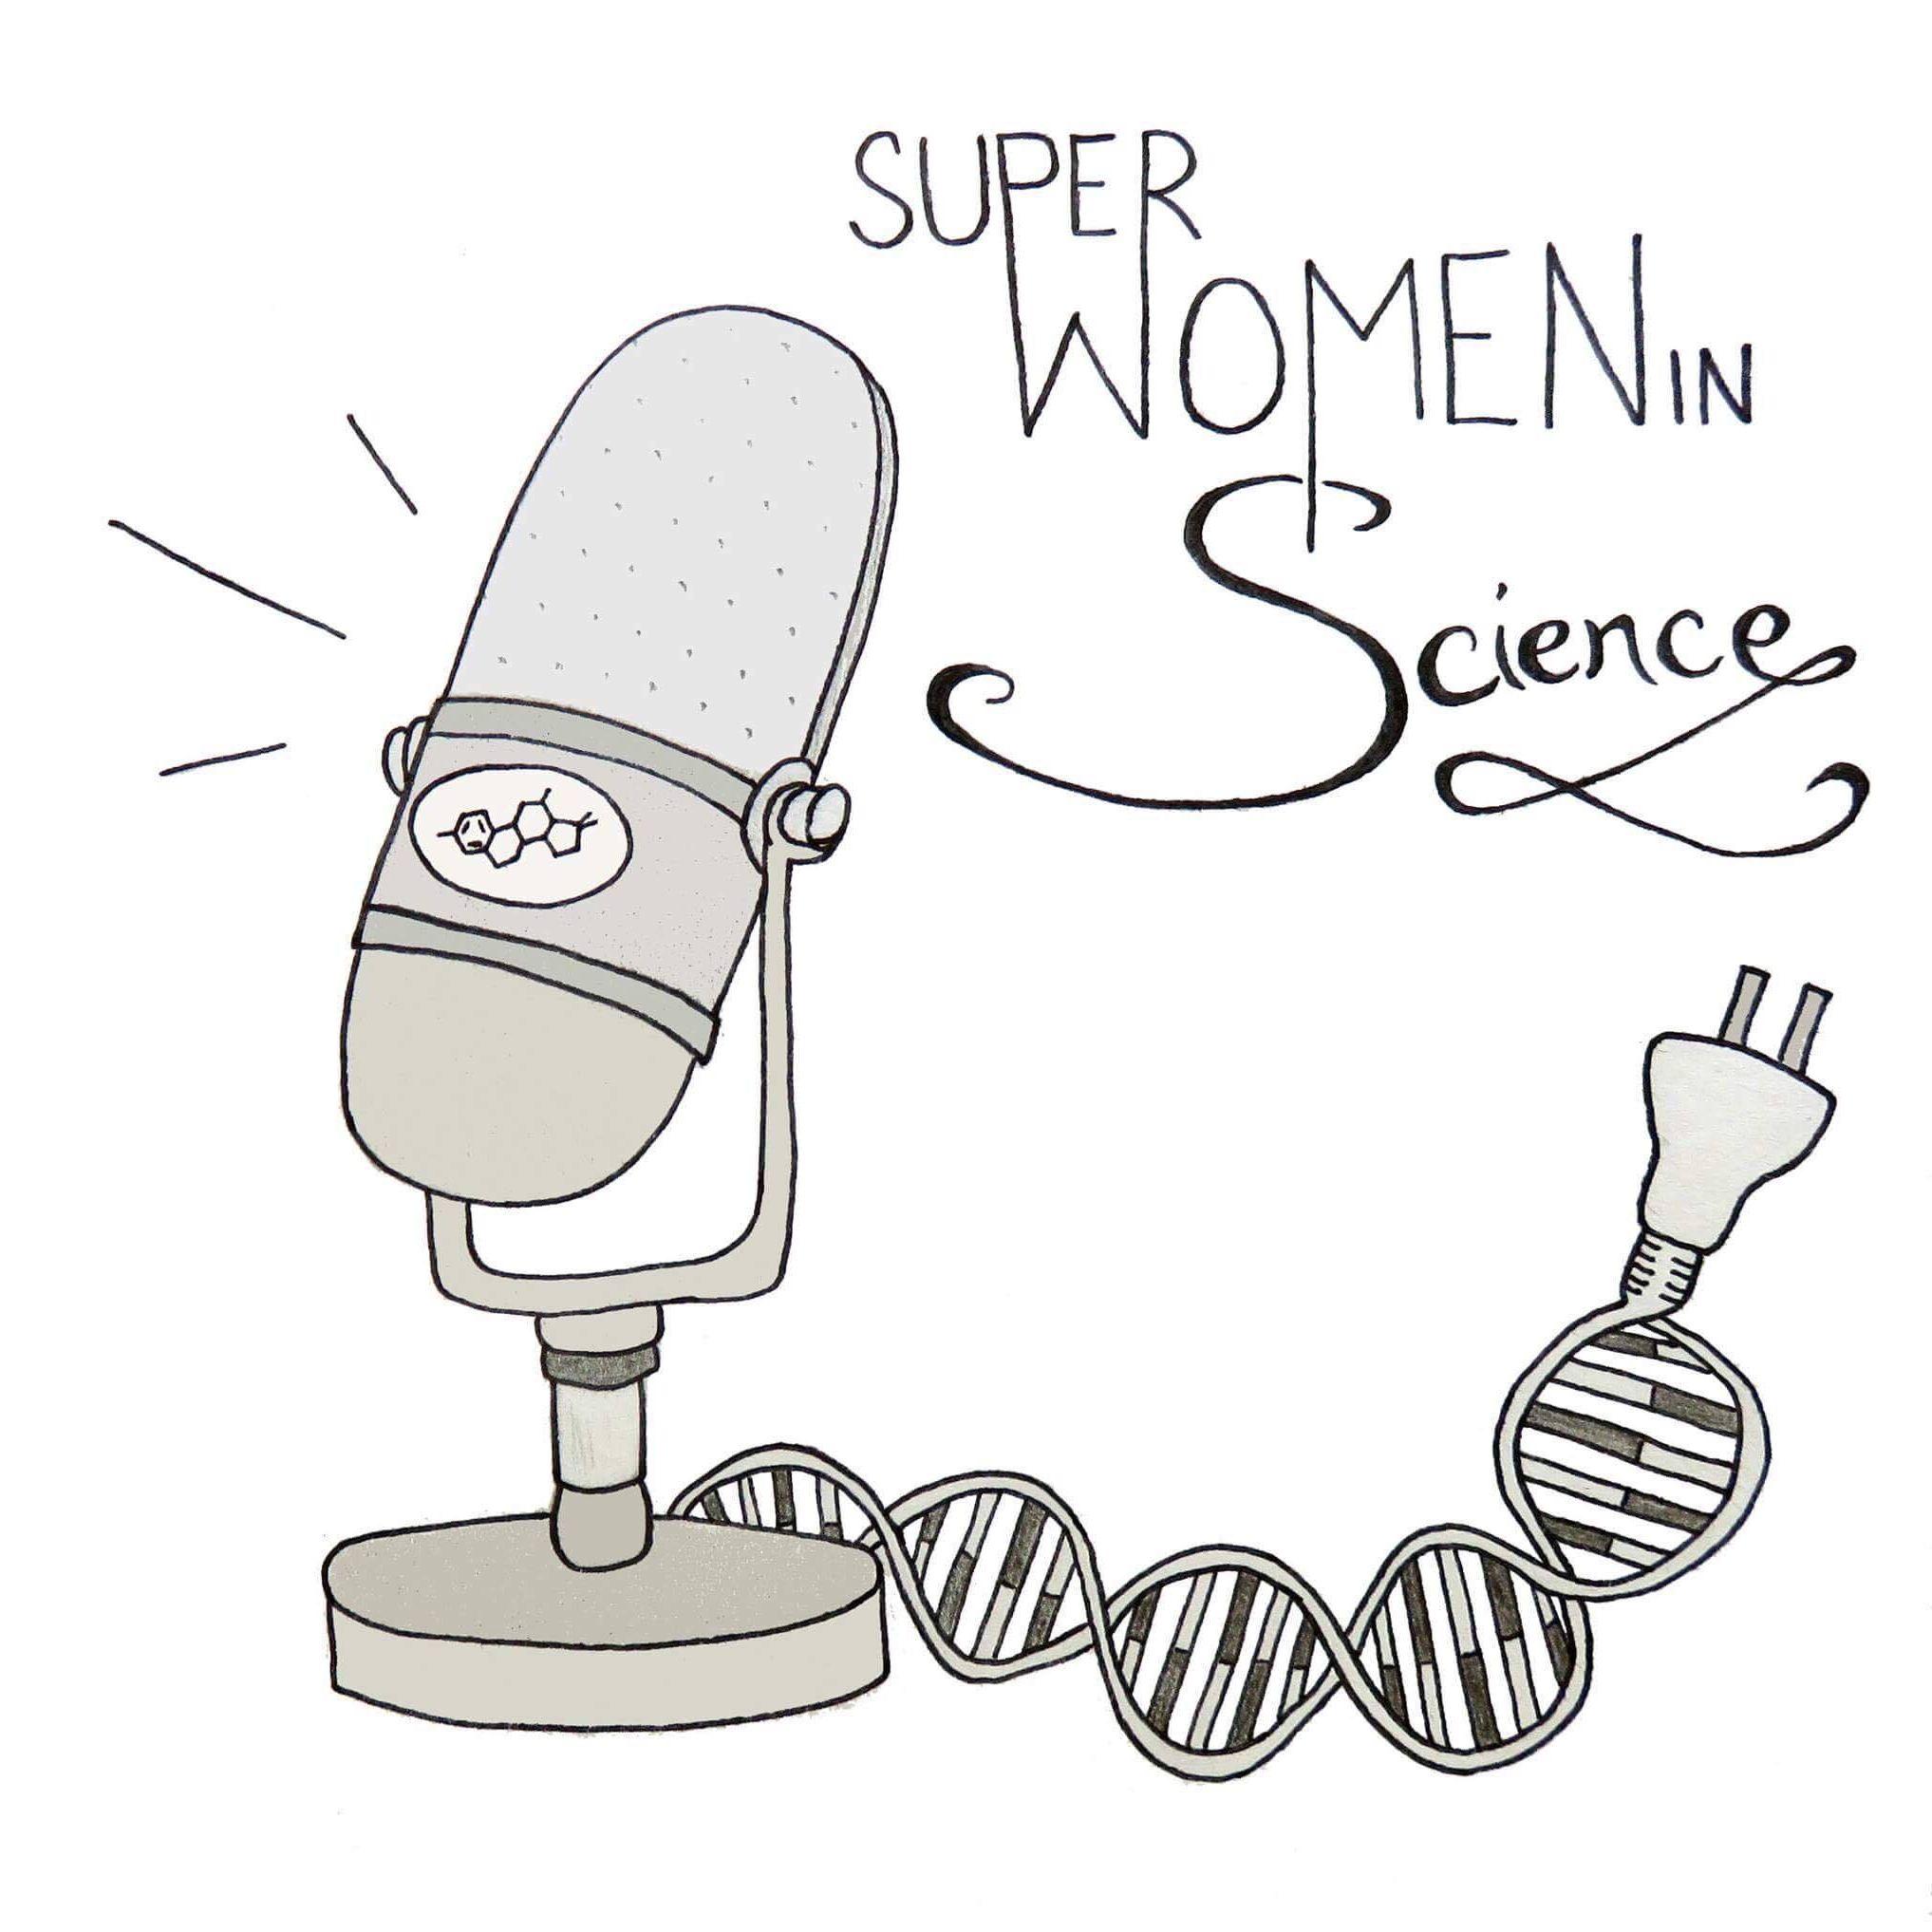 Superwomen in Science on Podchaser